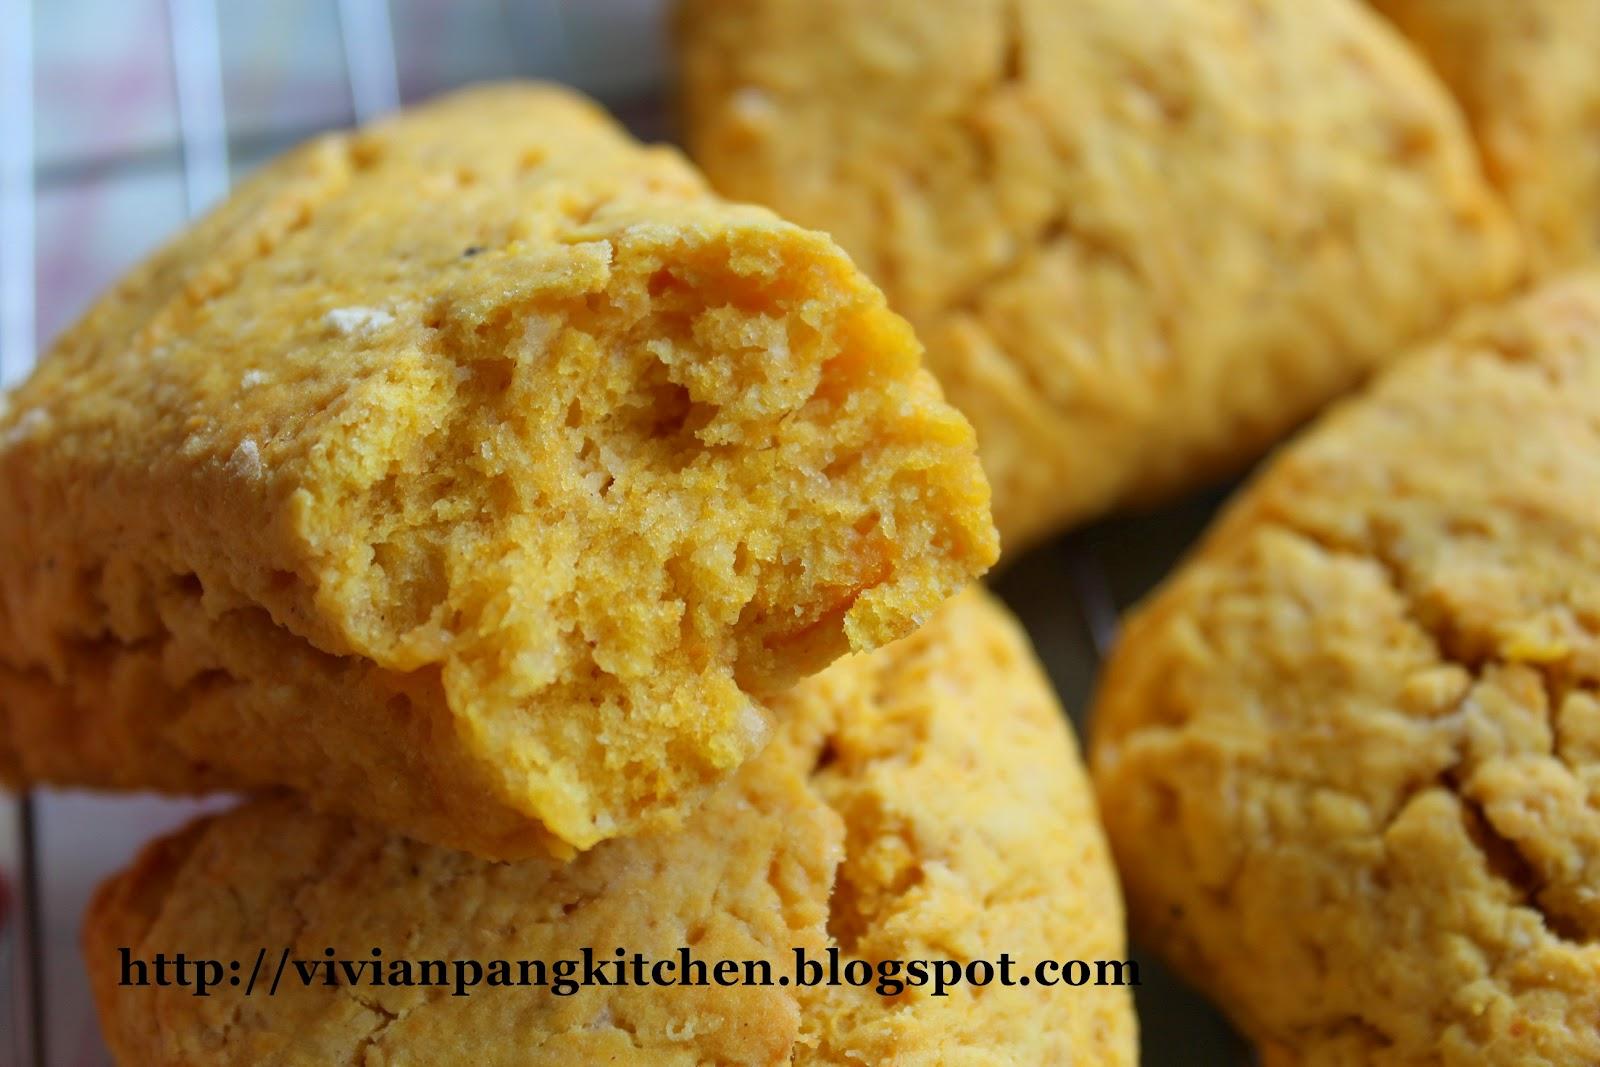 Vivian Pang Kitchen: Starbucks Pumpkin Scones